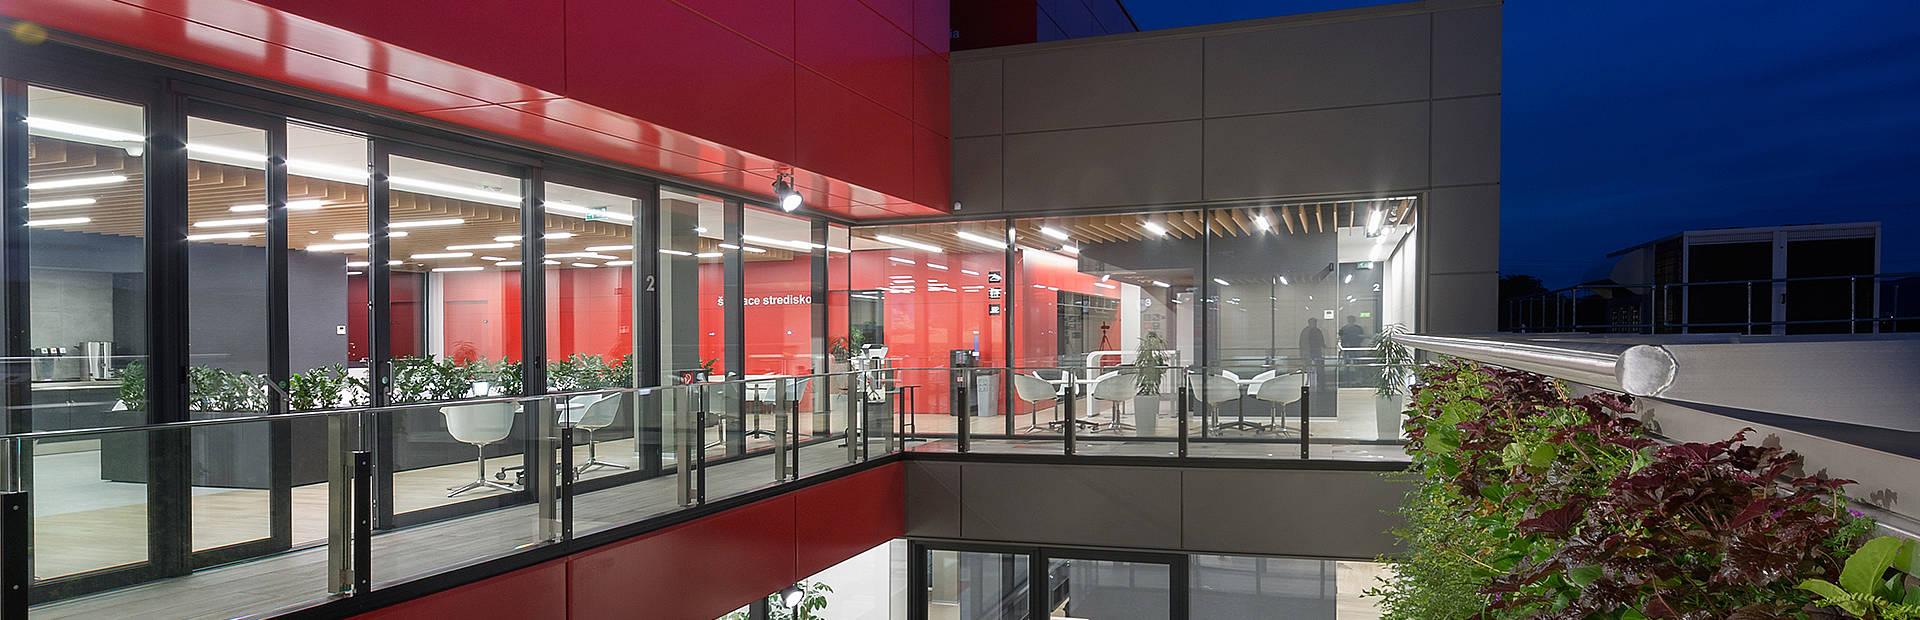 Trimo energetsko učinkovite fasadne rešitve